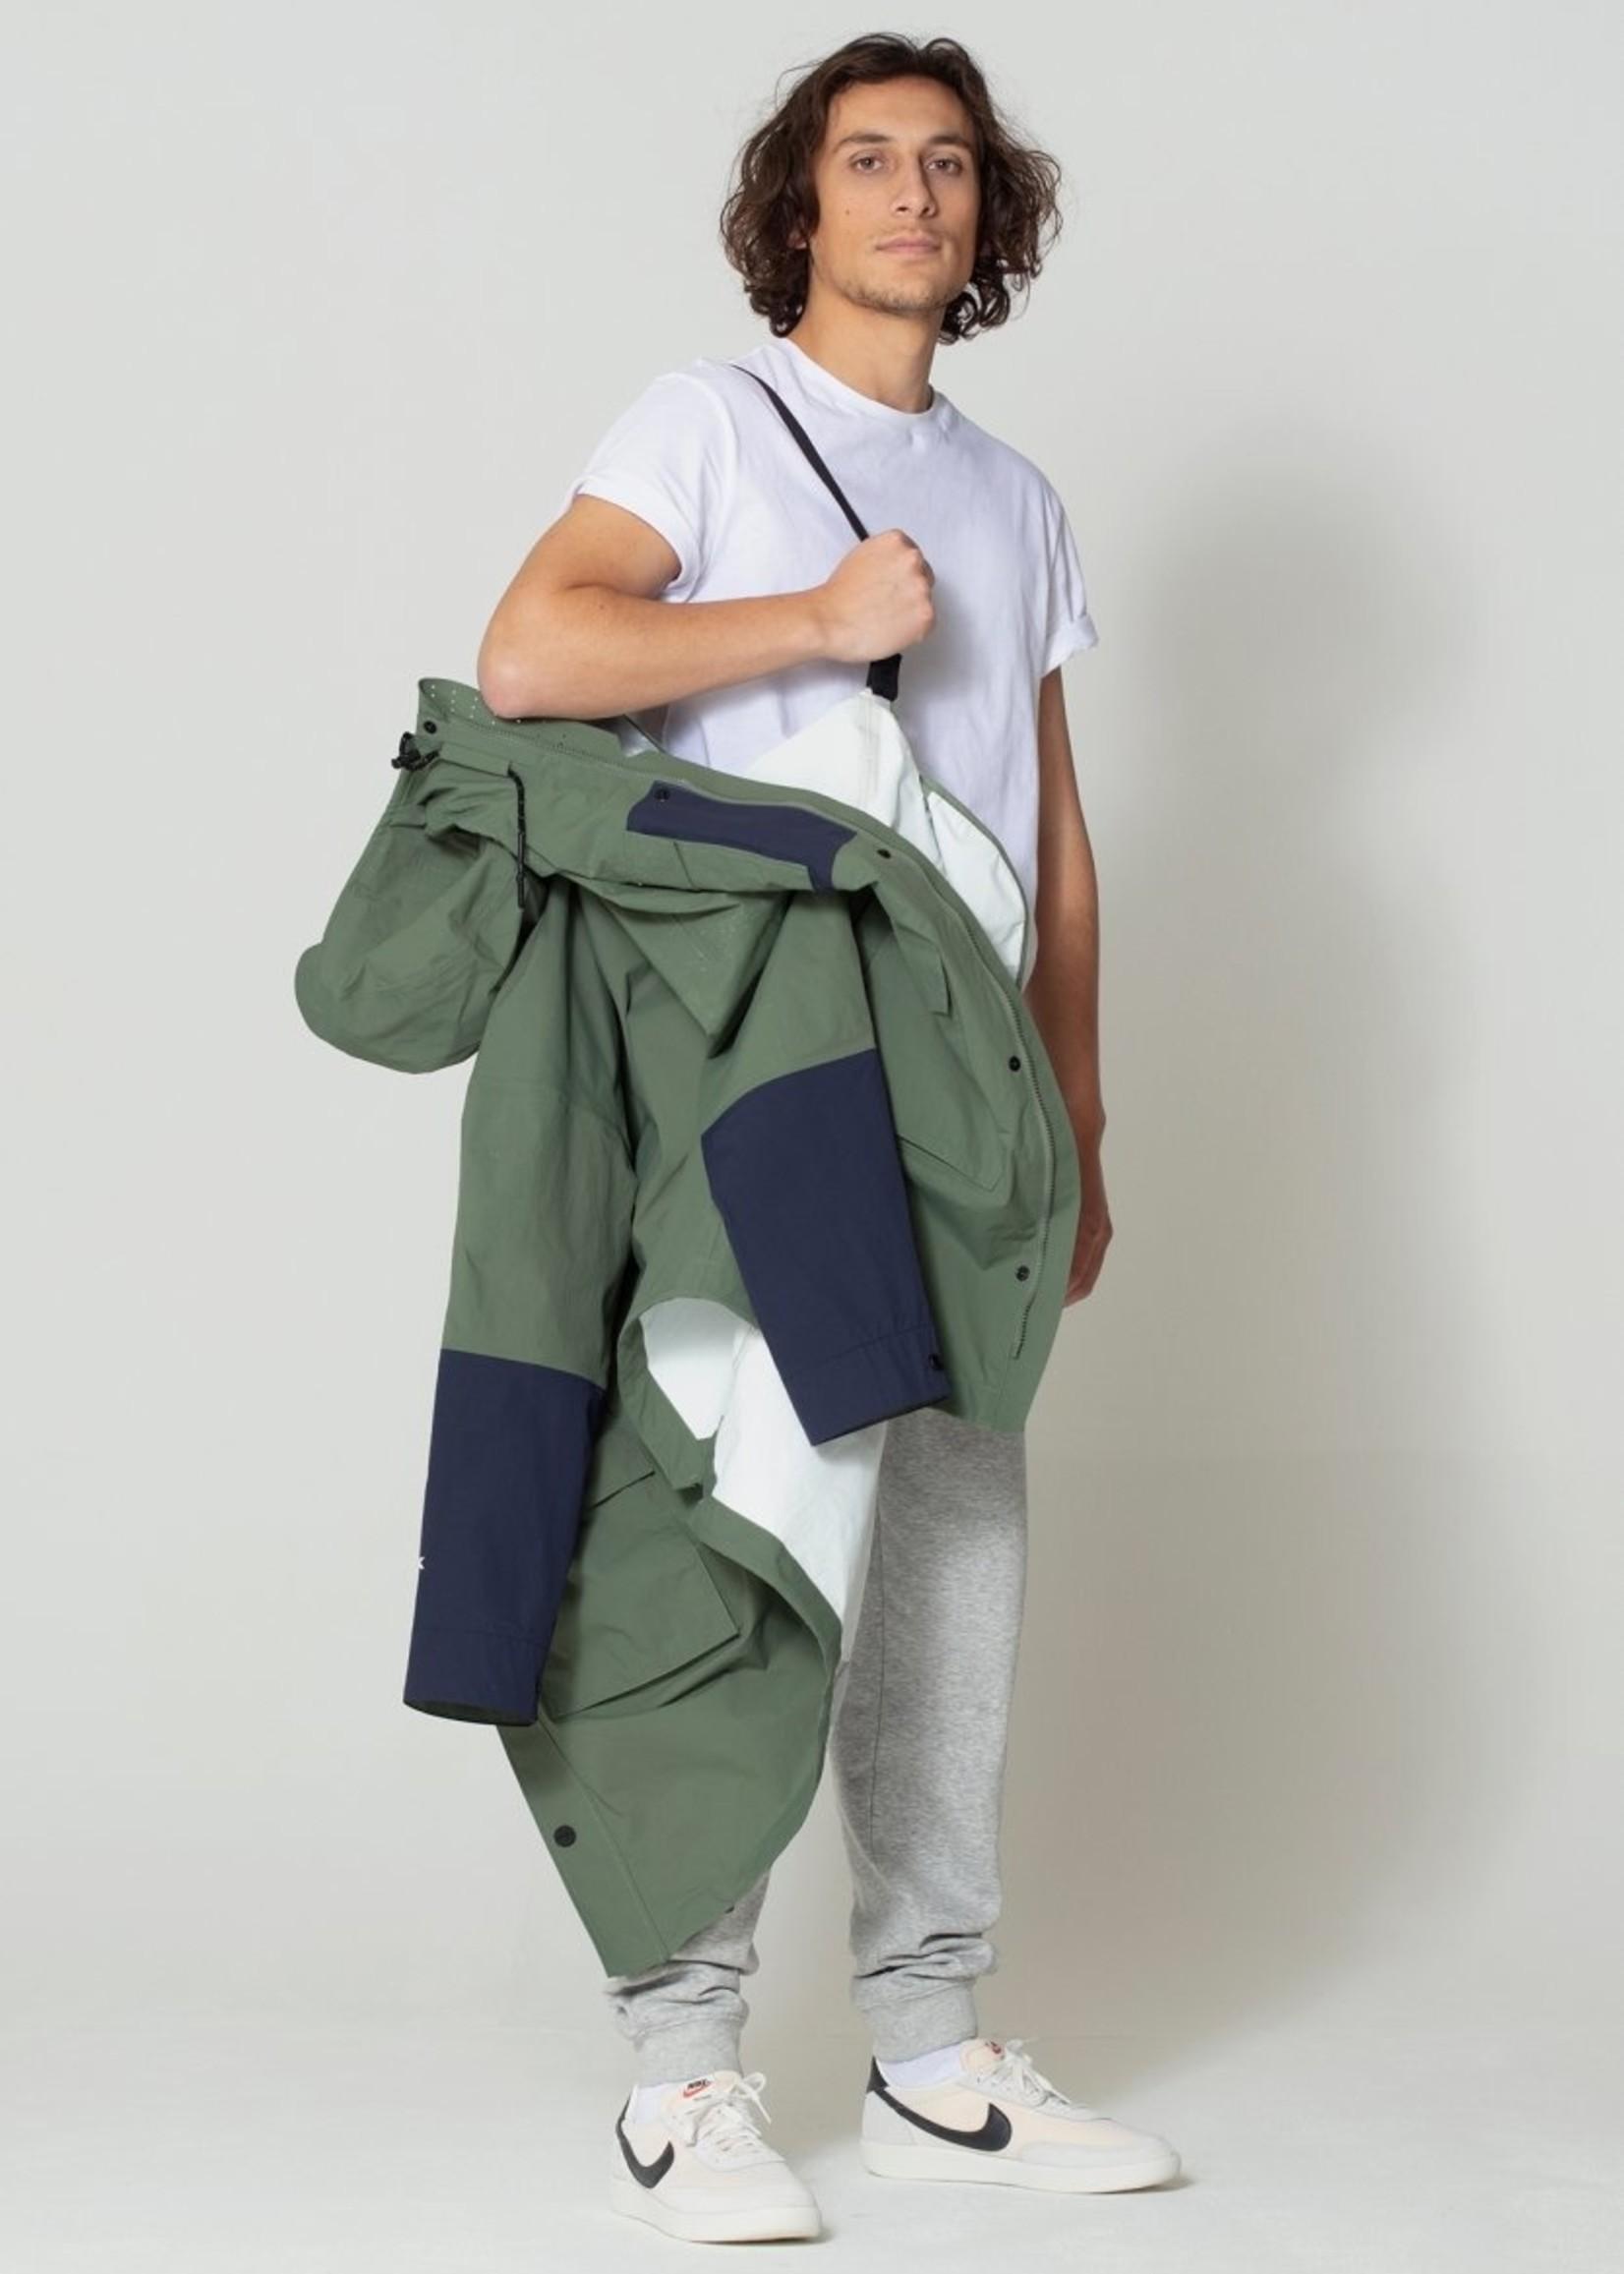 Gofranck Seabreeze Jacket